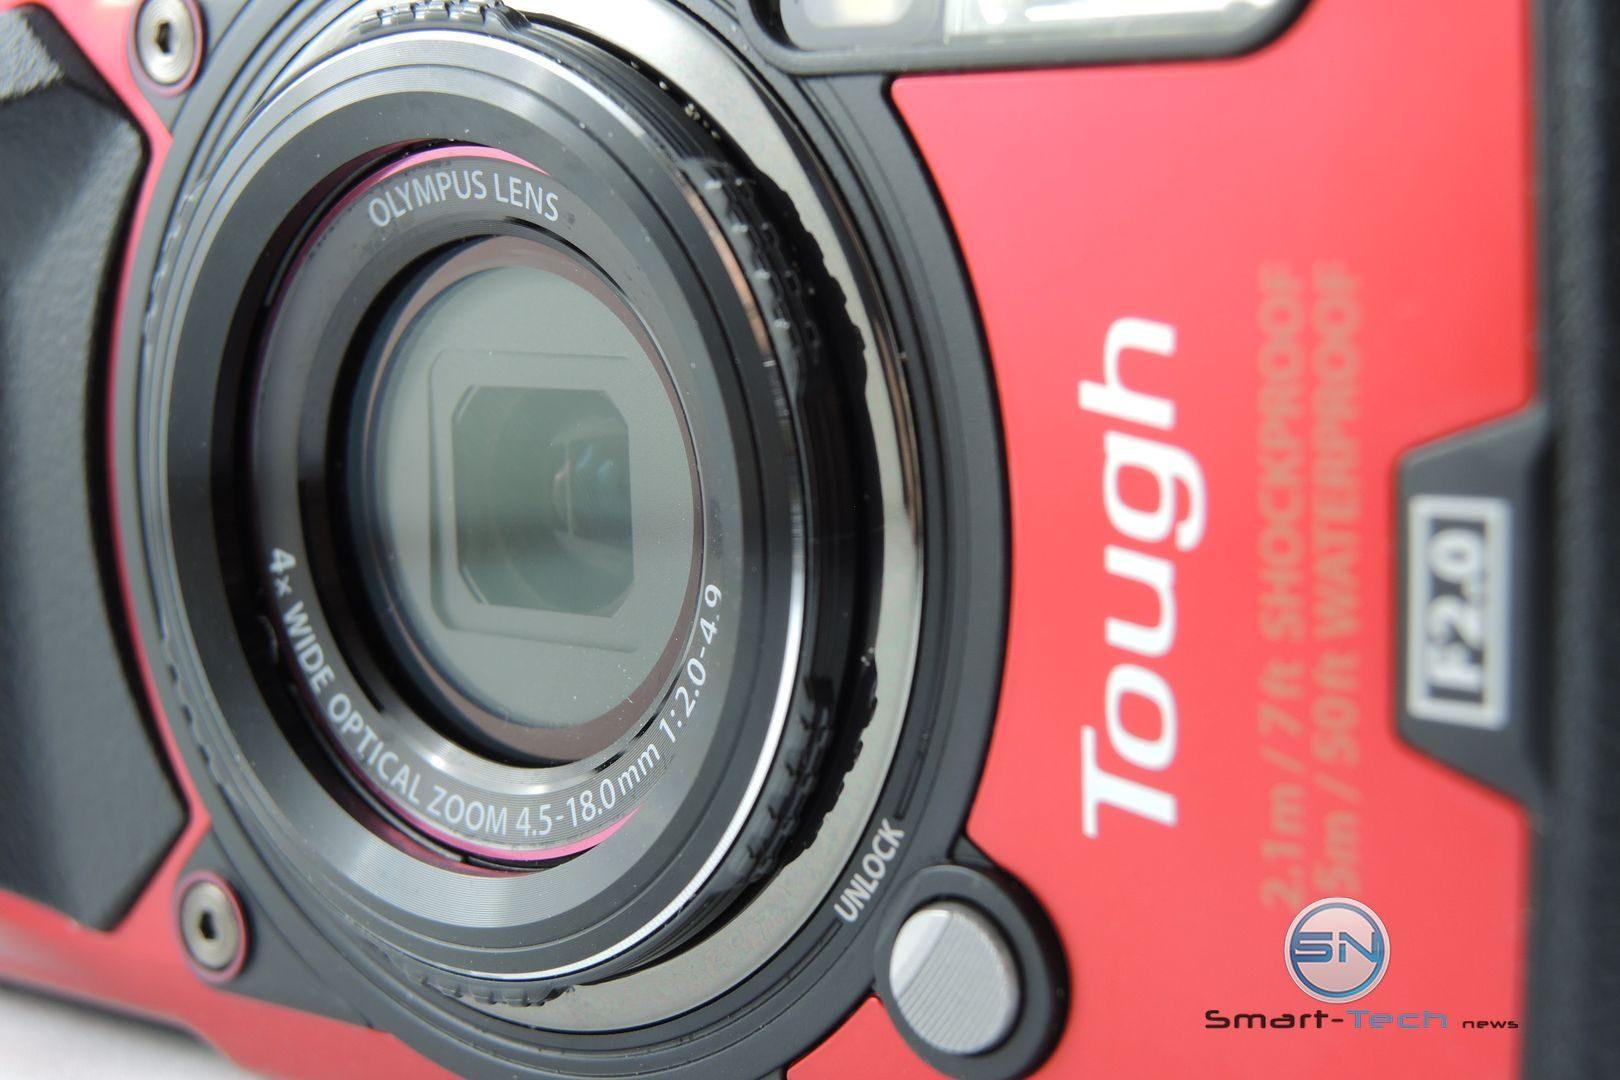 Objektiv Olympus TG 5 die Outdoor Kamera - SmartTechNews